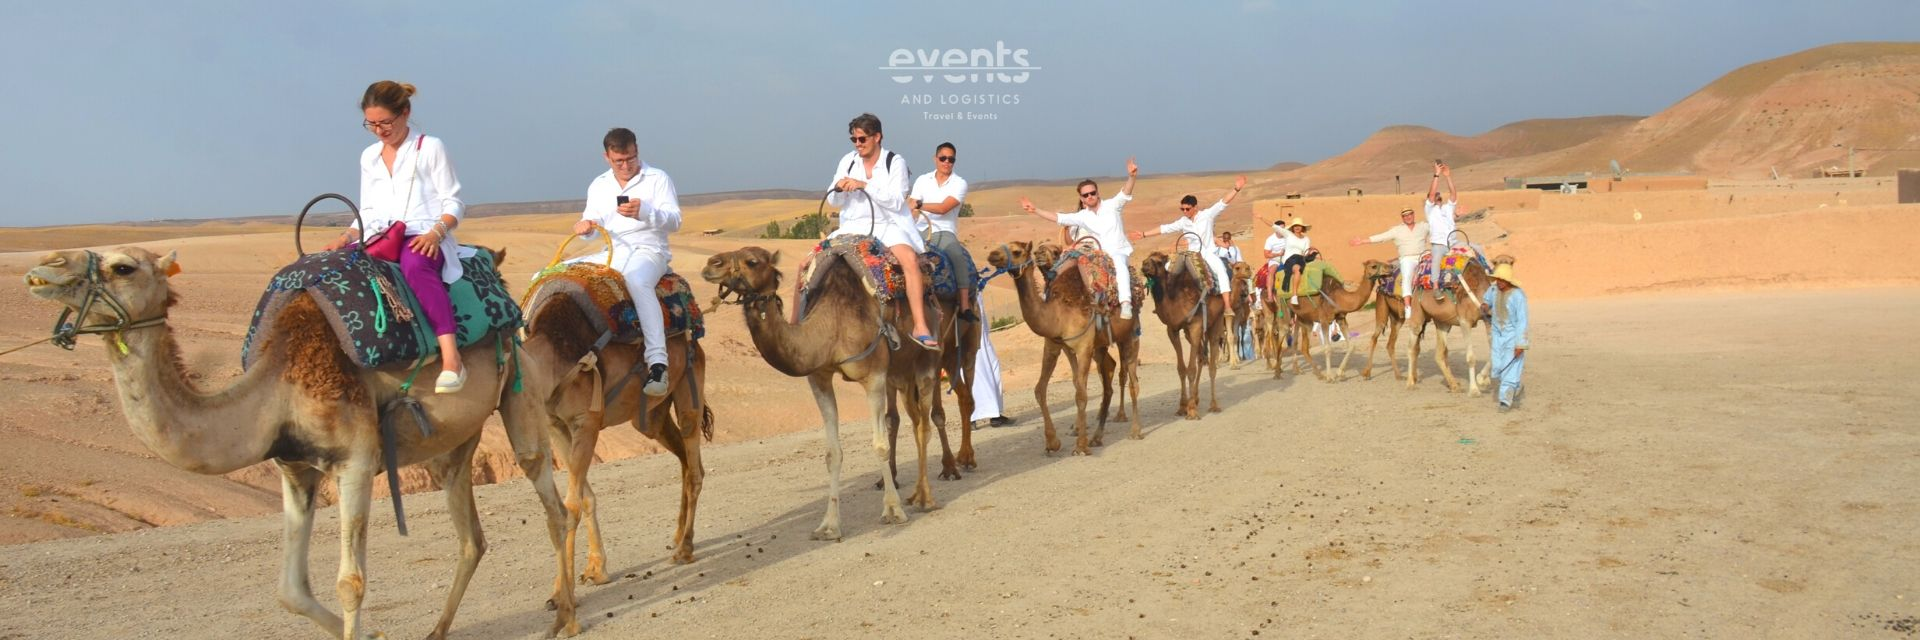 Decouverte-dromadaire-palmeraie-desert-agafay-marrakech-marrakech